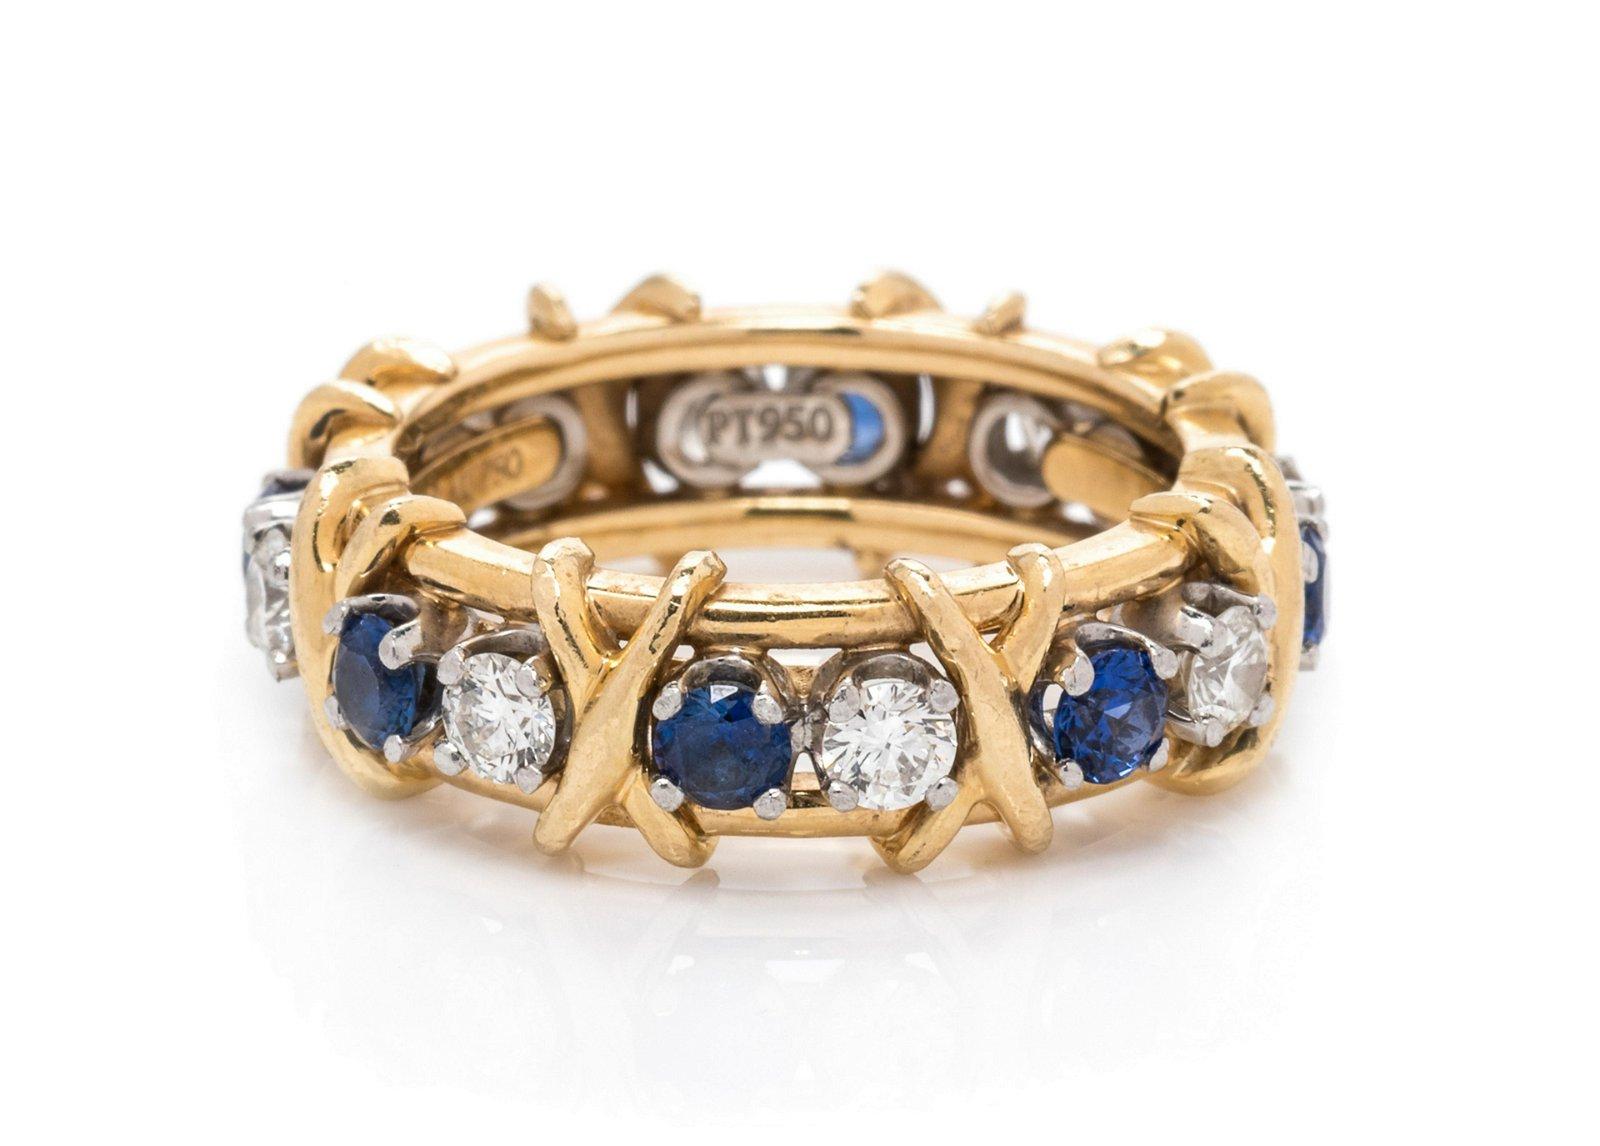 An 18 Karat Yellow Gold, Platinum, Diamond and Sapphire